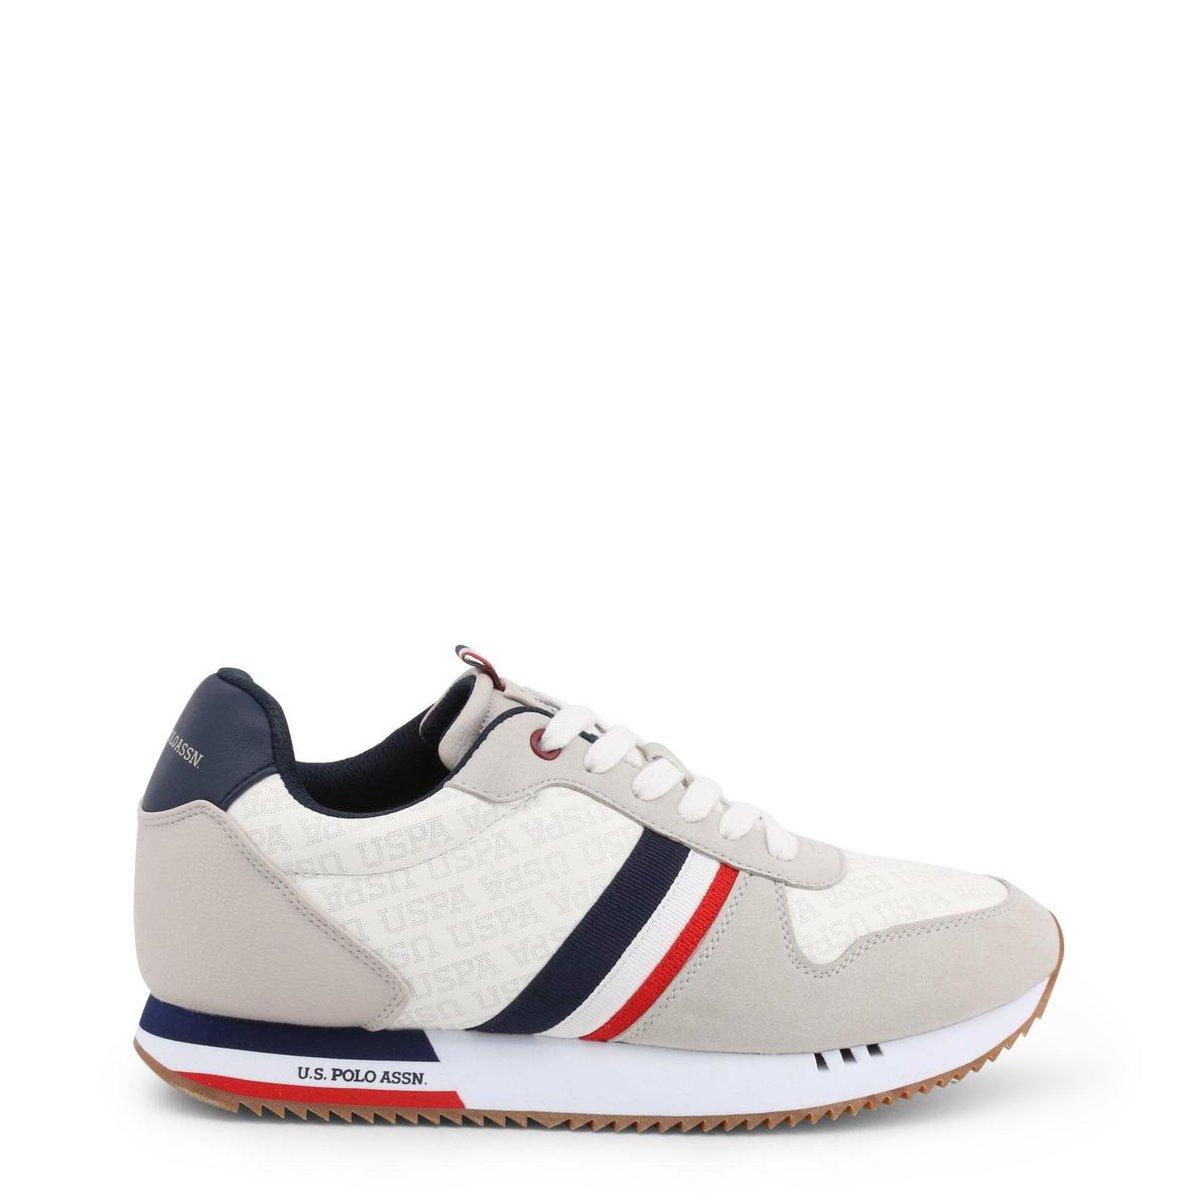 U.S. Polo Assn. - CORAD4248W9_Y1 blue / EU 45 Sportschoenen